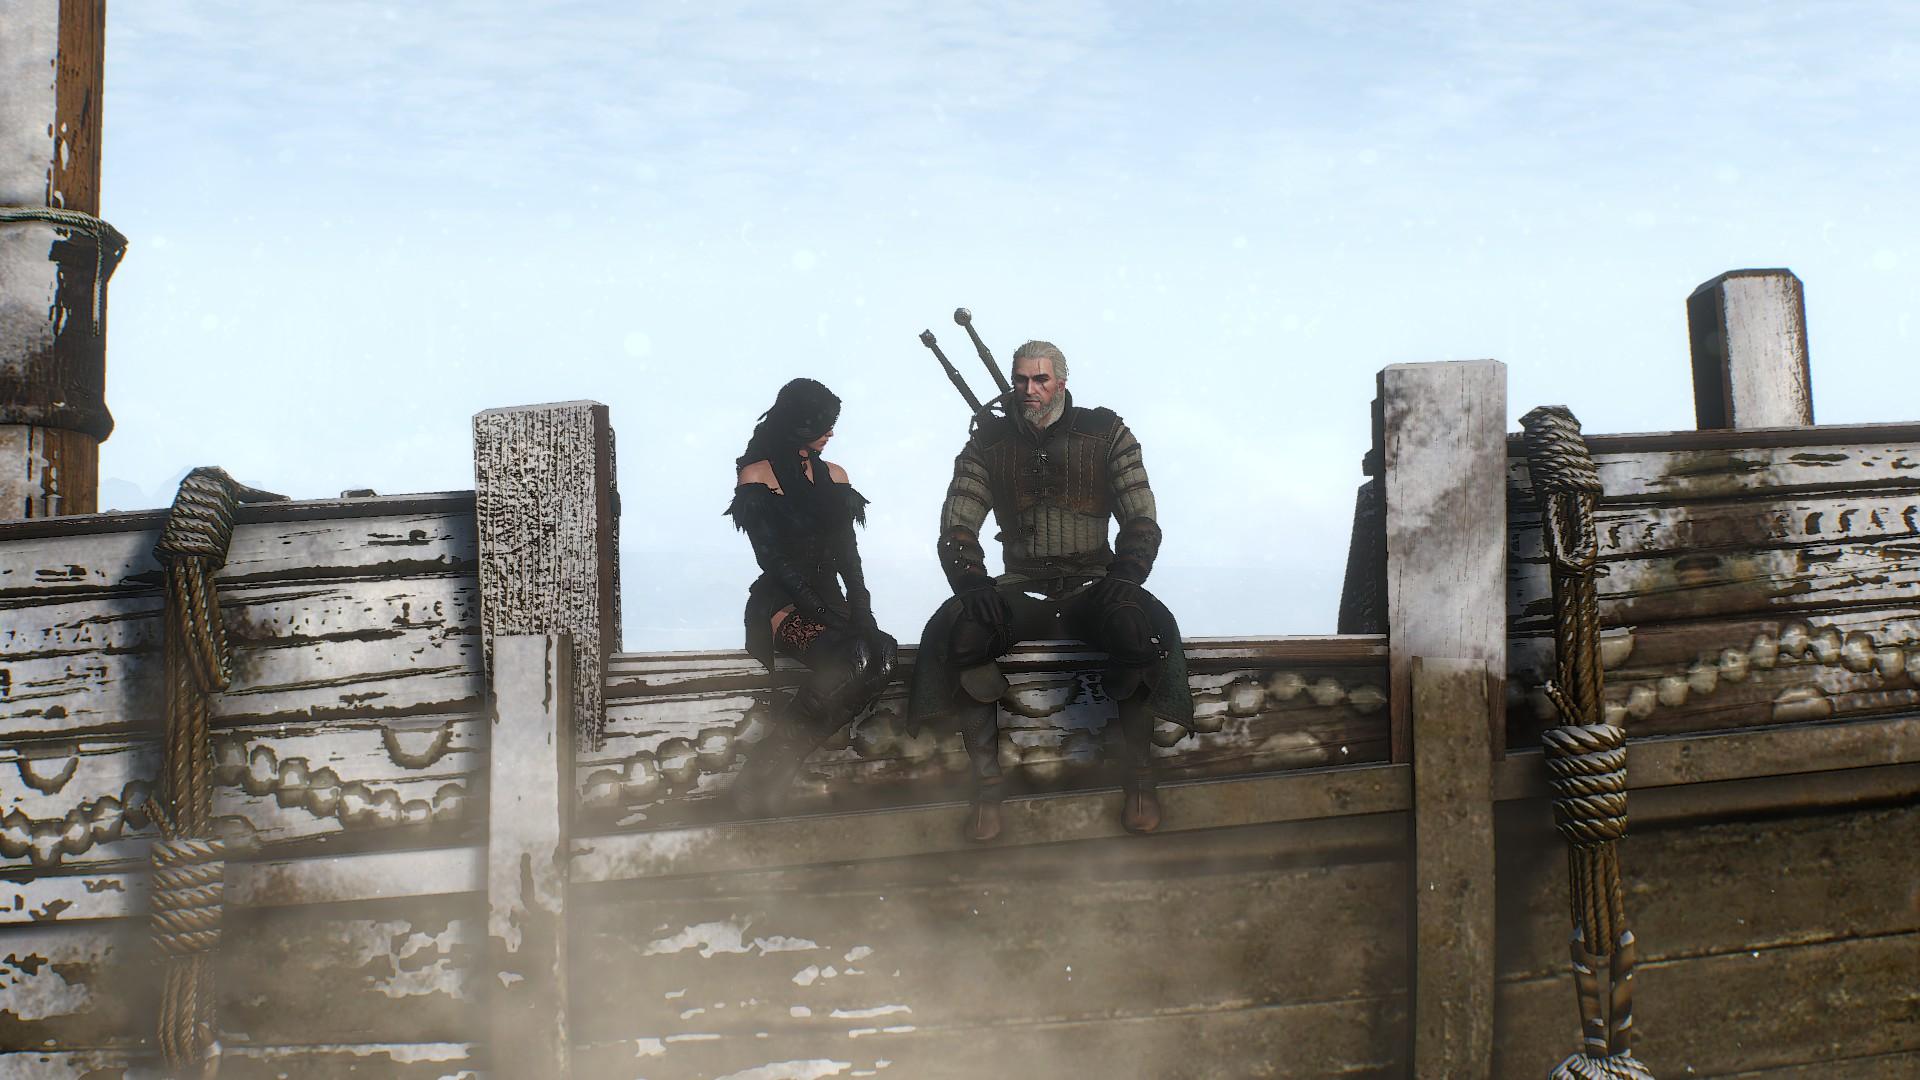 General 1920x1080 The Witcher 3: Wild Hunt Yennefer of Vengerberg Geralt of Rivia The Witcher Yennefer screen shot Skellige